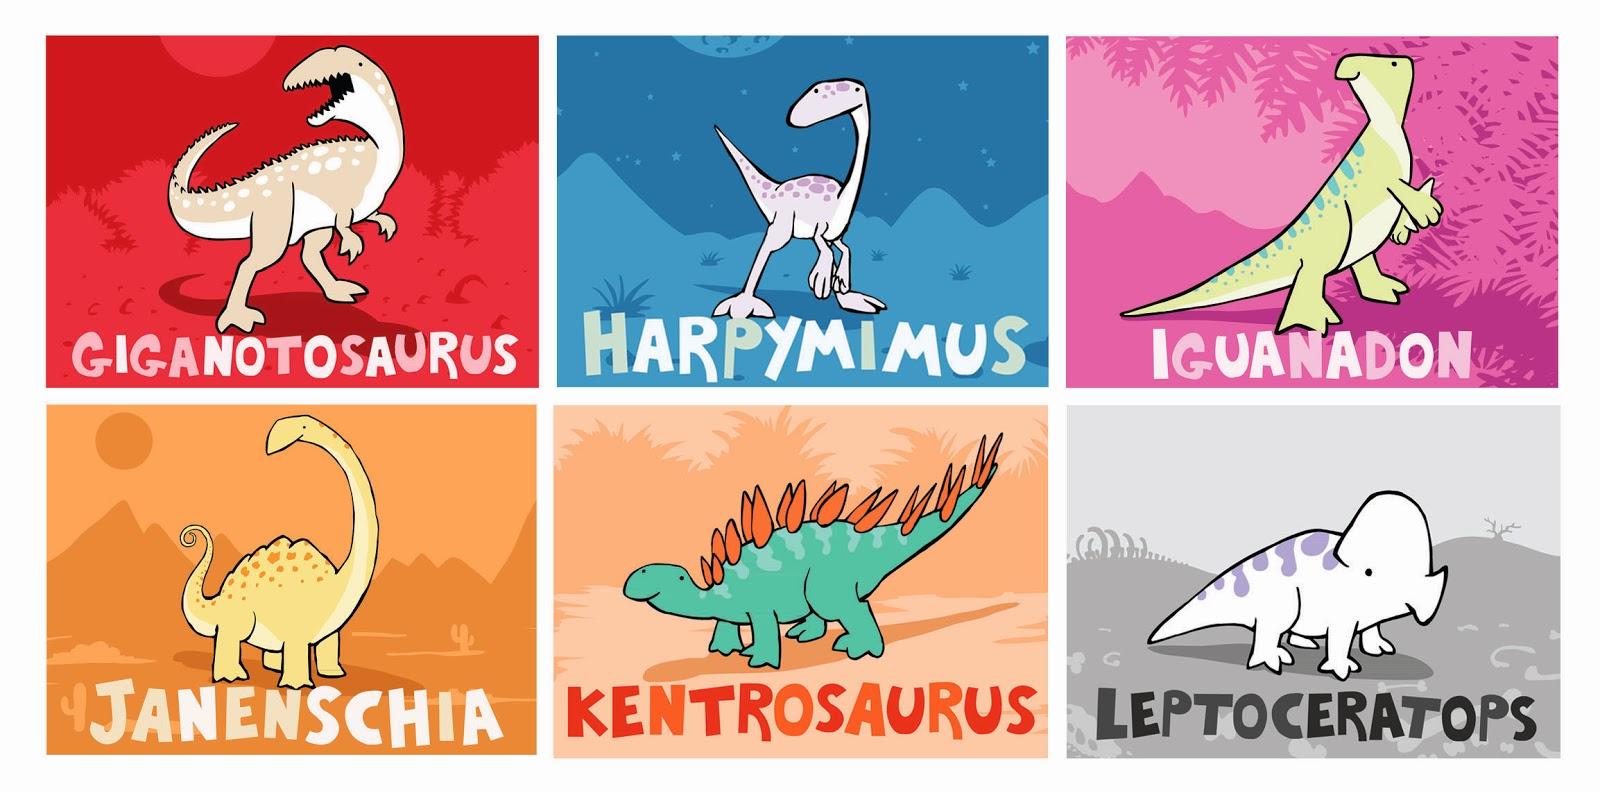 Giganotosaurus Harpymimus Iguanadon Janenschia Kentrosaurus Leptoceratops